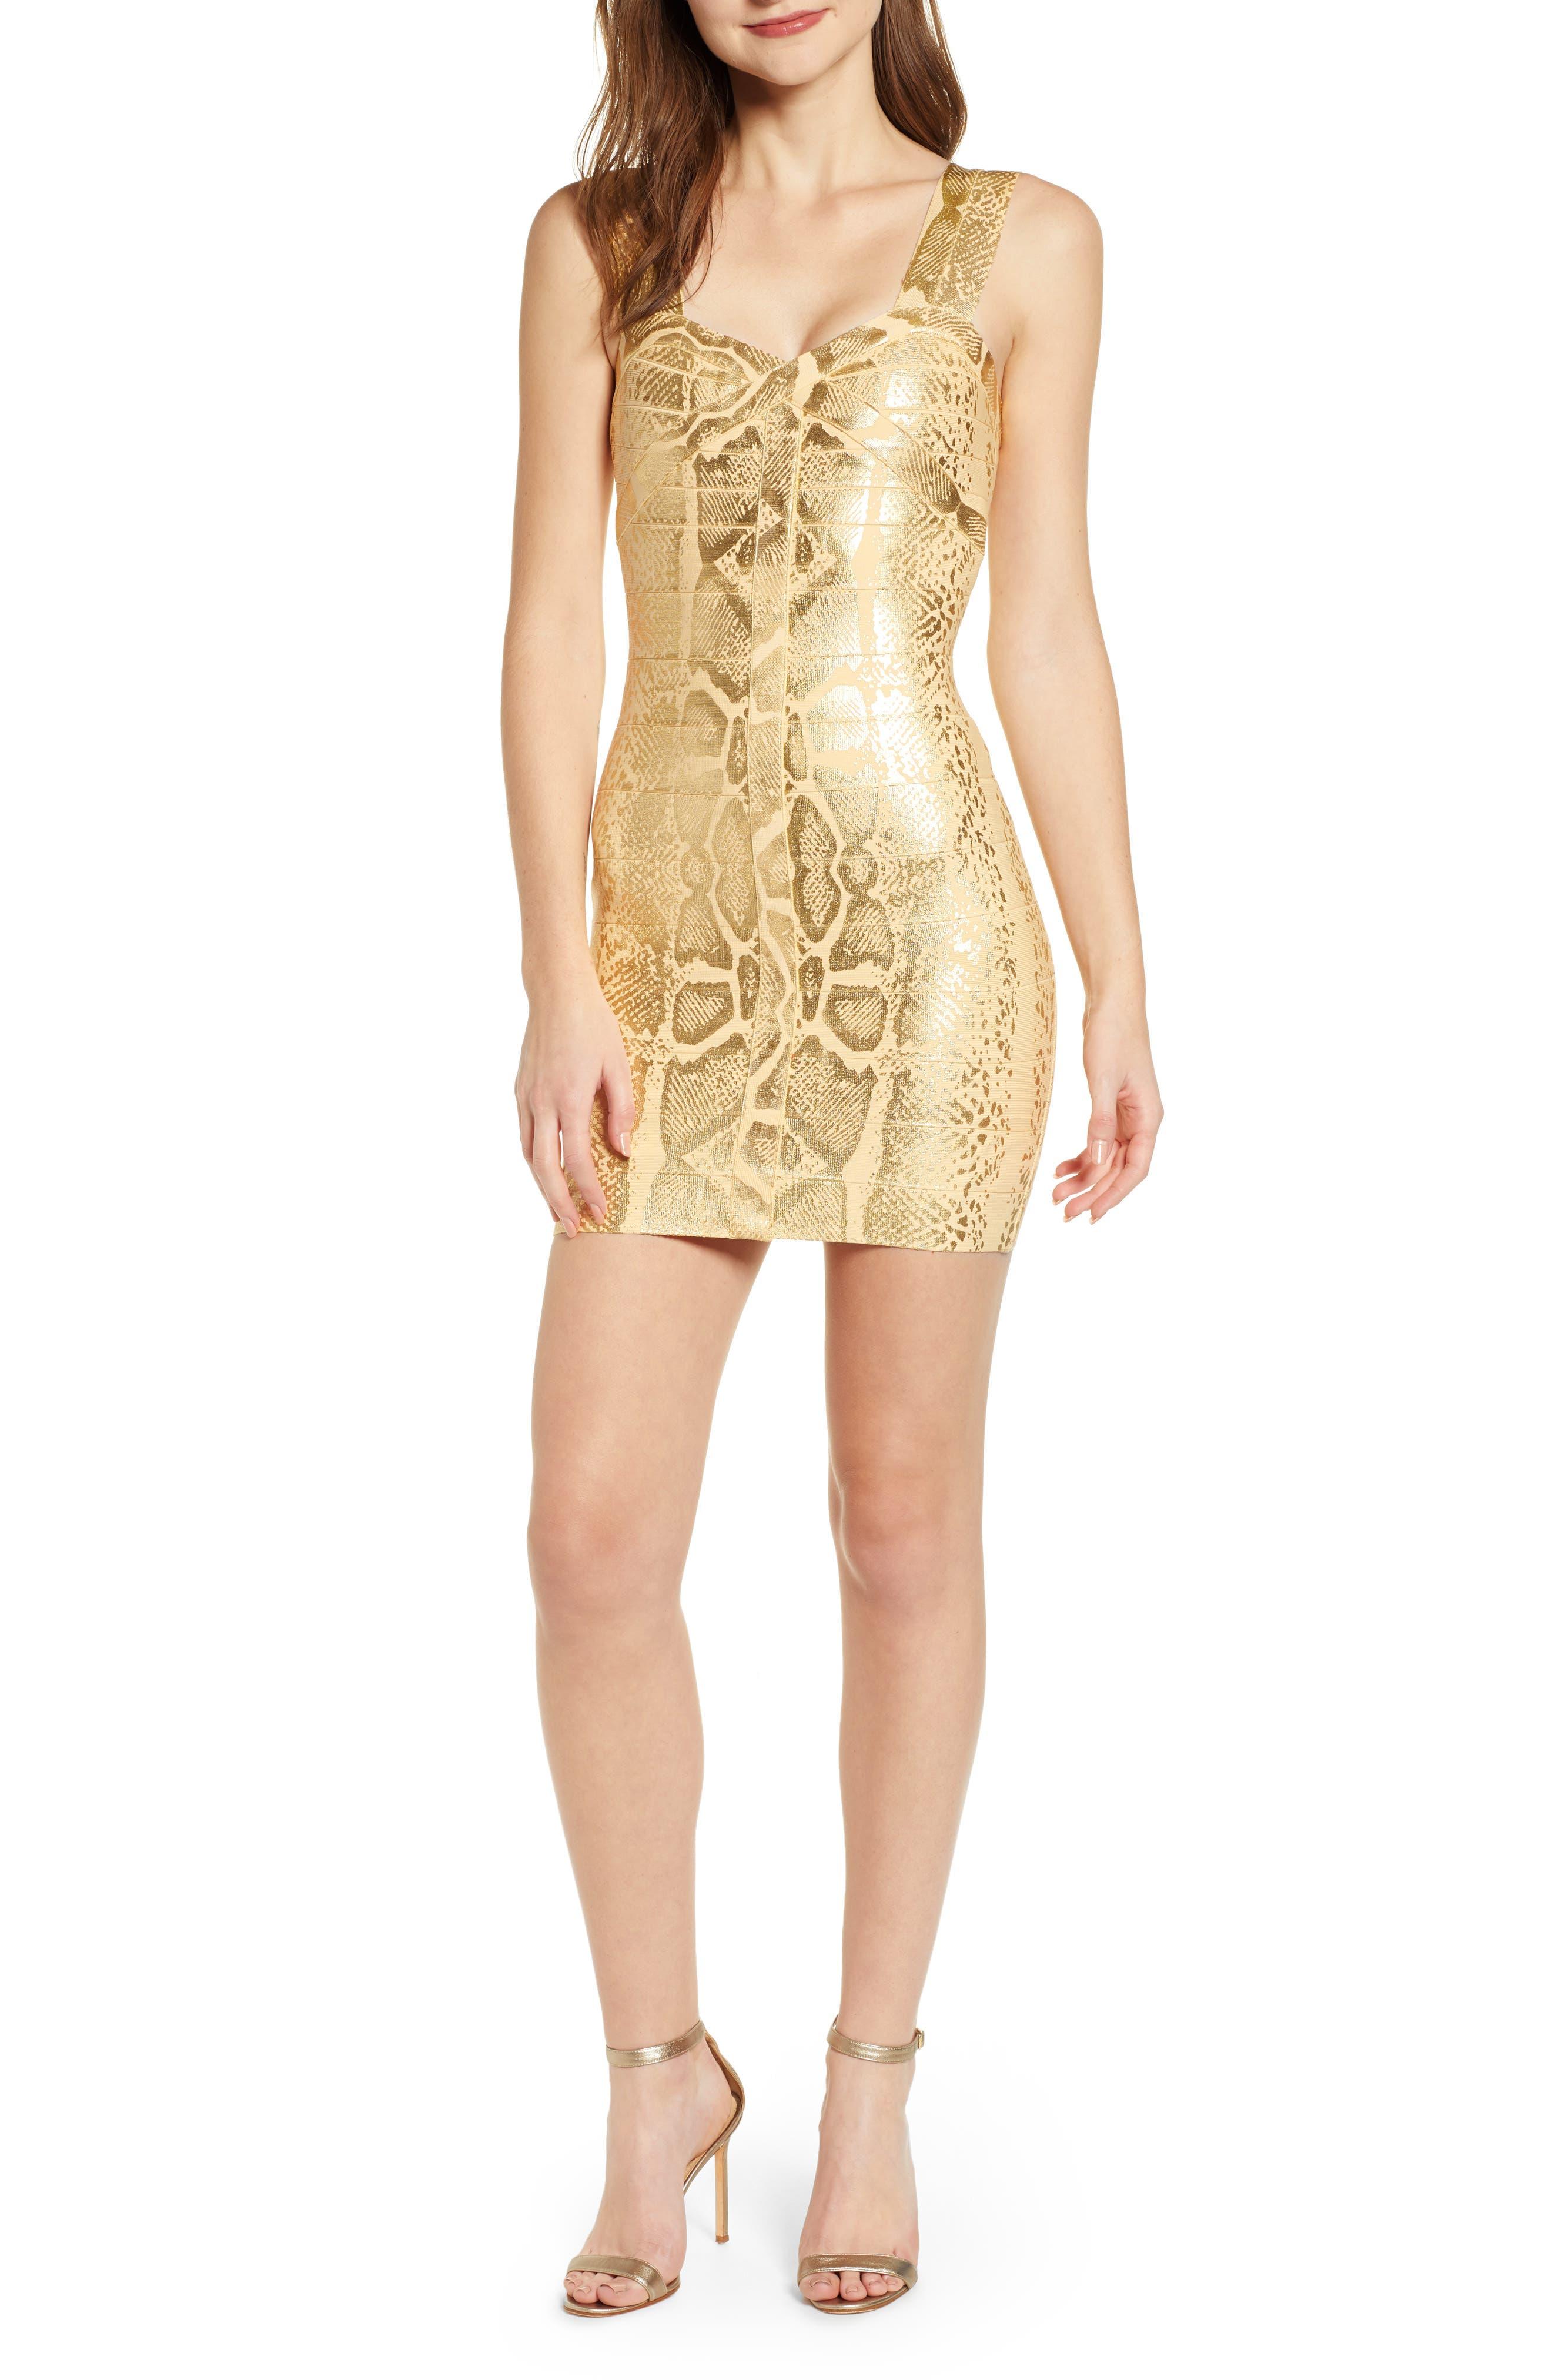 Sentimental Ny Metallic Bandage Body-Con Dress, Metallic